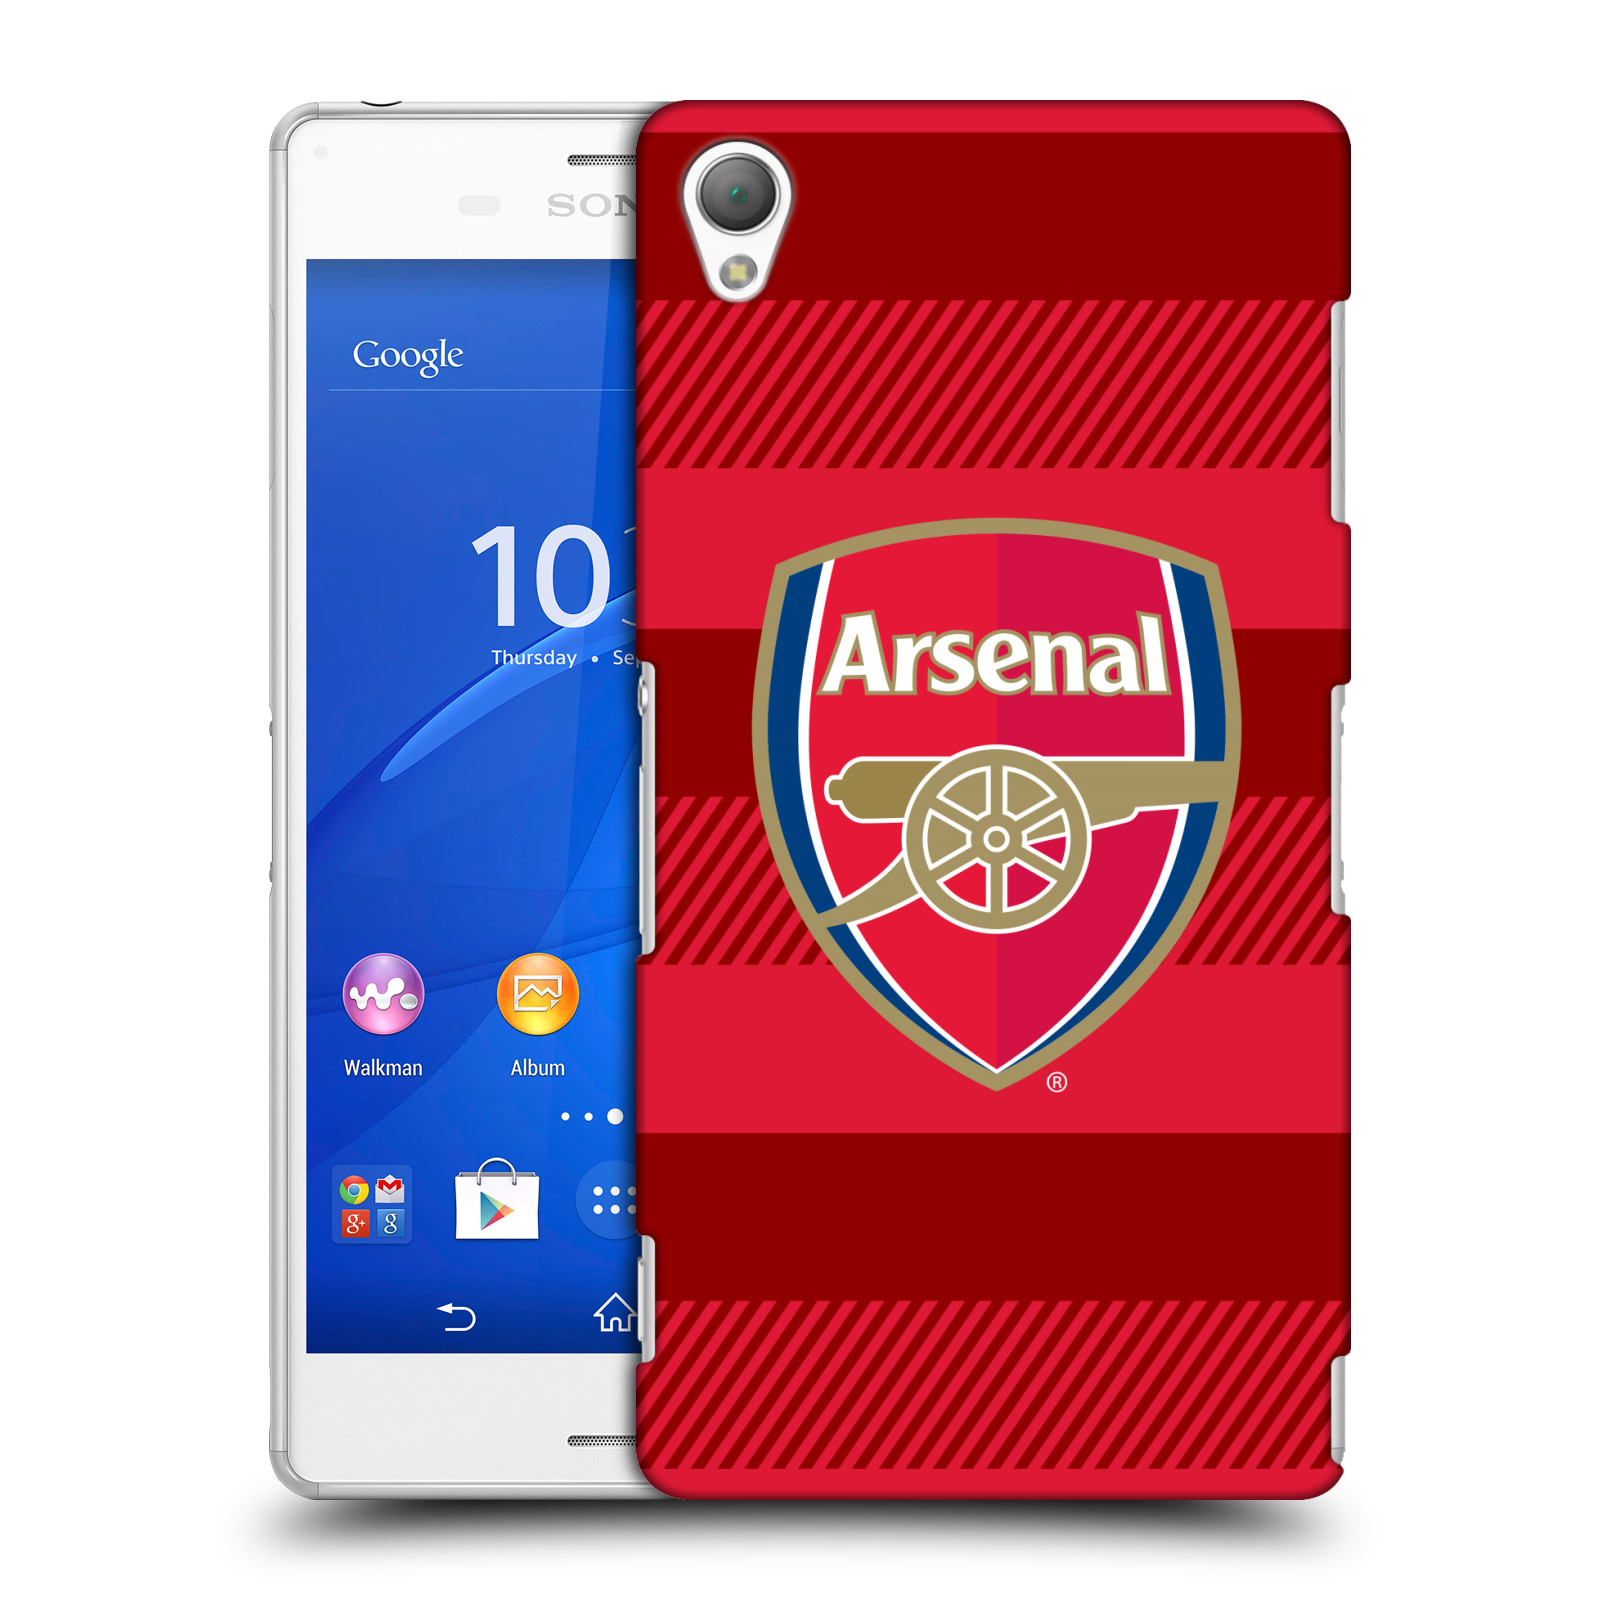 Plastové pouzdro na mobil Sony Xperia Z3 D6603 - Head Case - Arsenal FC - Logo s pruhy